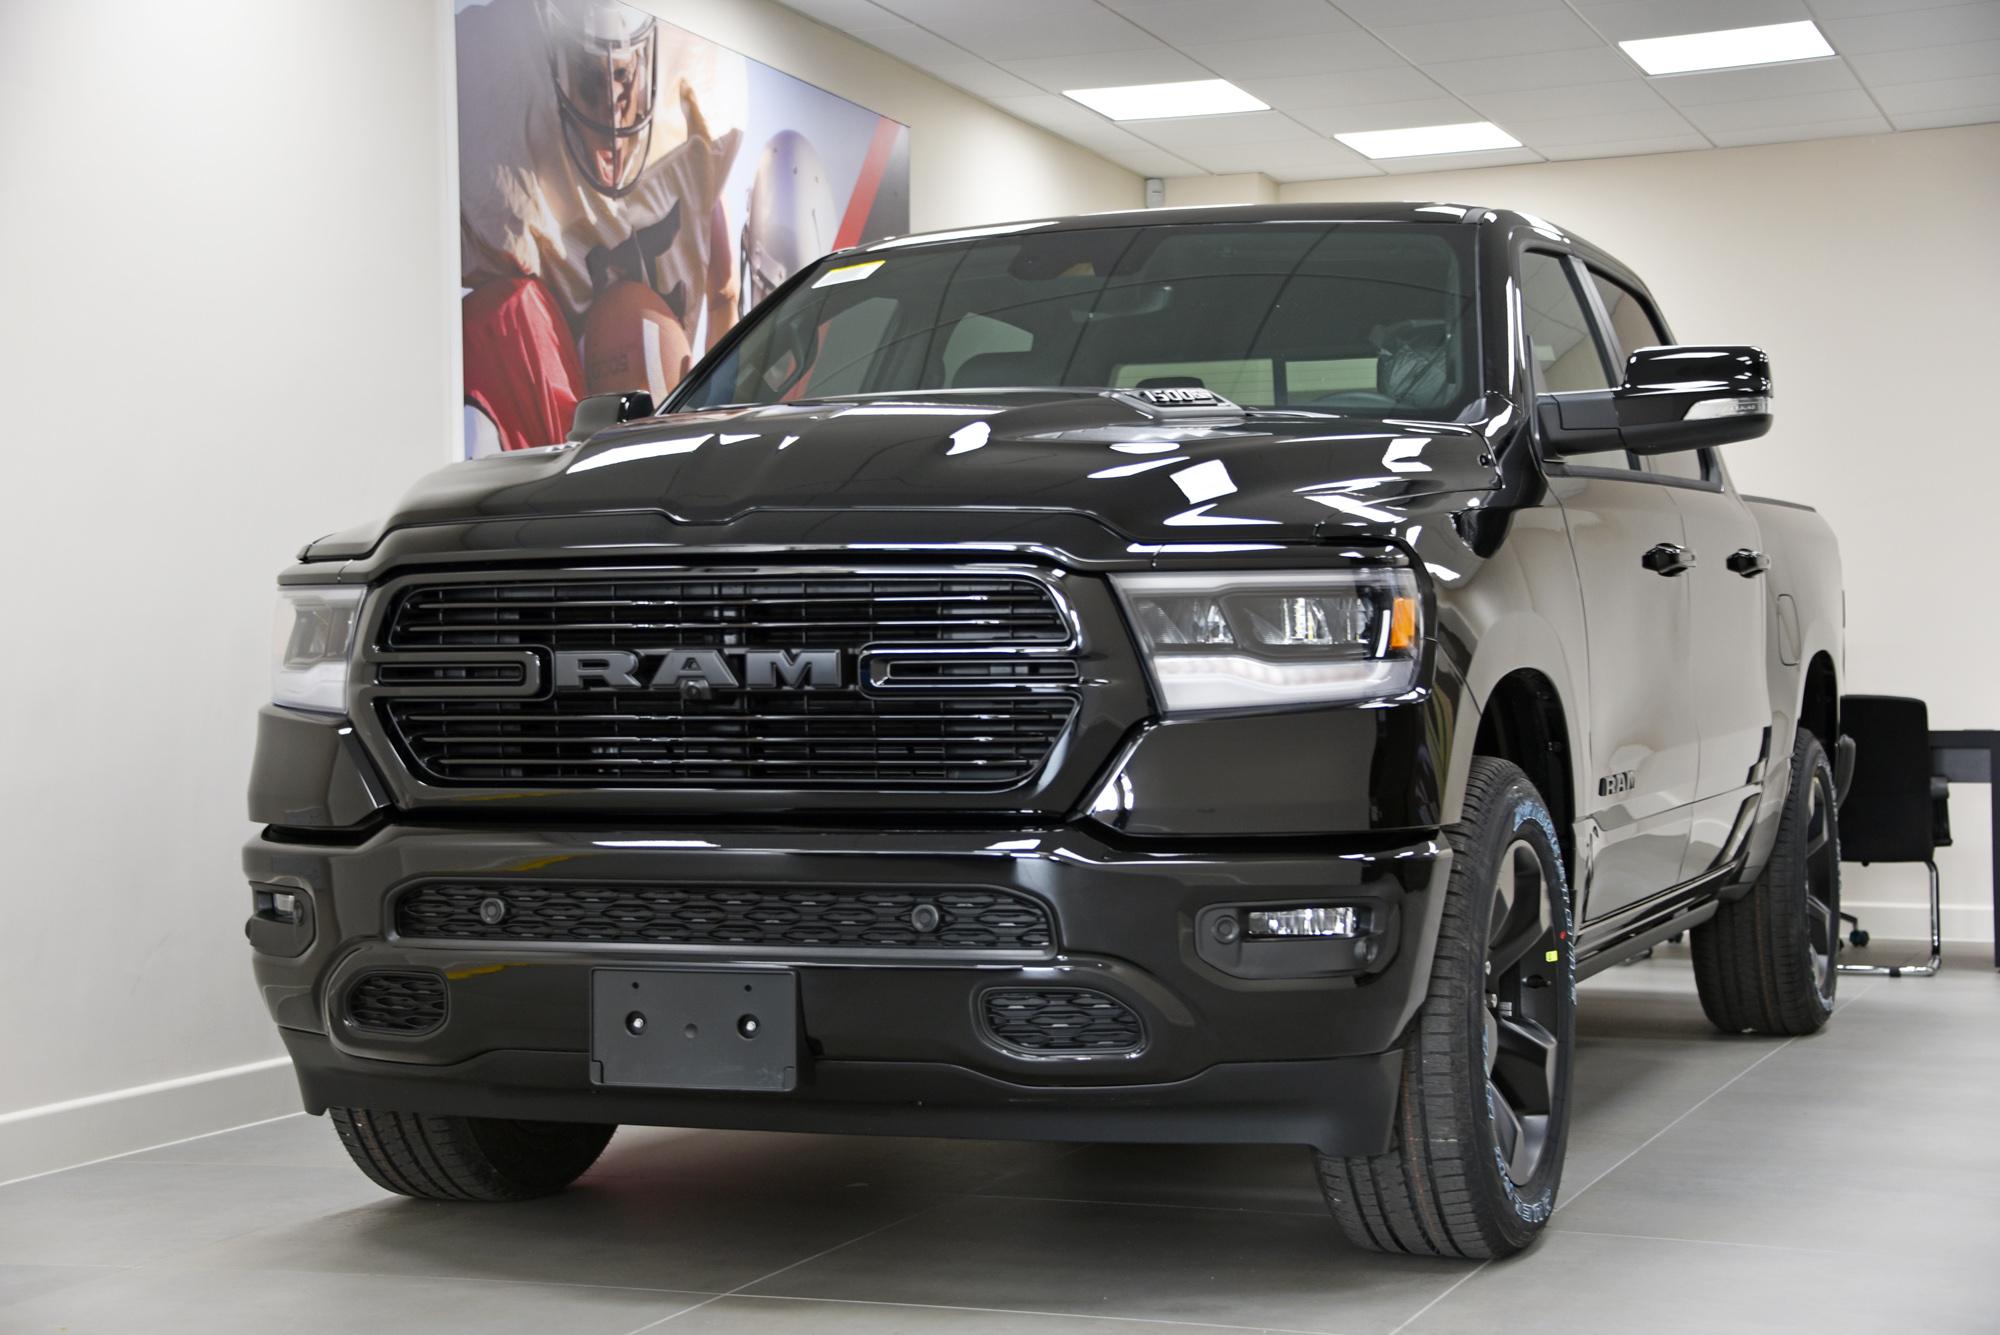 Dodge Ram Truck Bed For Sale >> 2019 Ram Sport Black Edition – David Boatwright ...